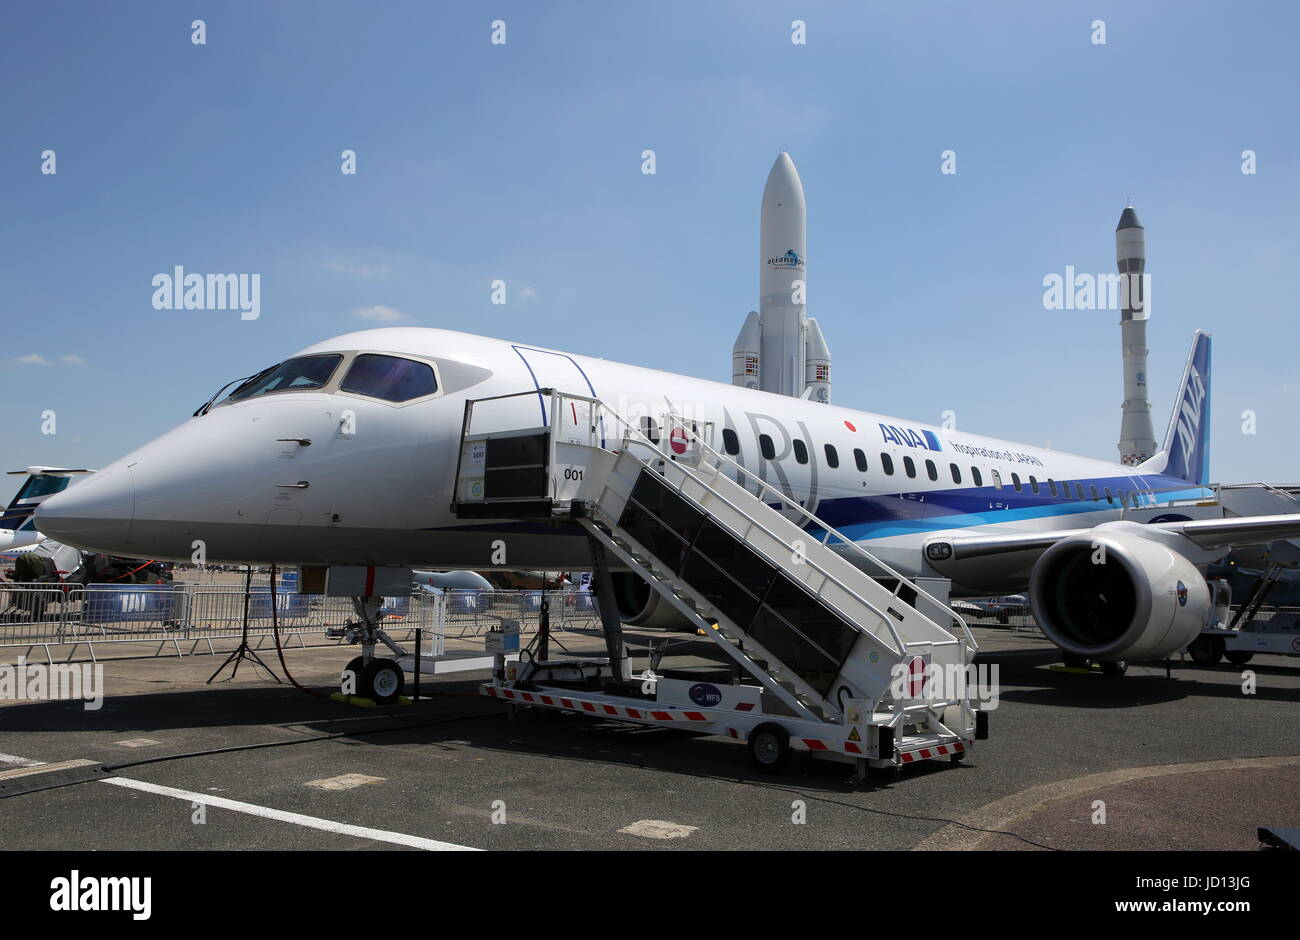 paris, france. 18th june, 2017. a mitsubishi regional jet (mrj stock